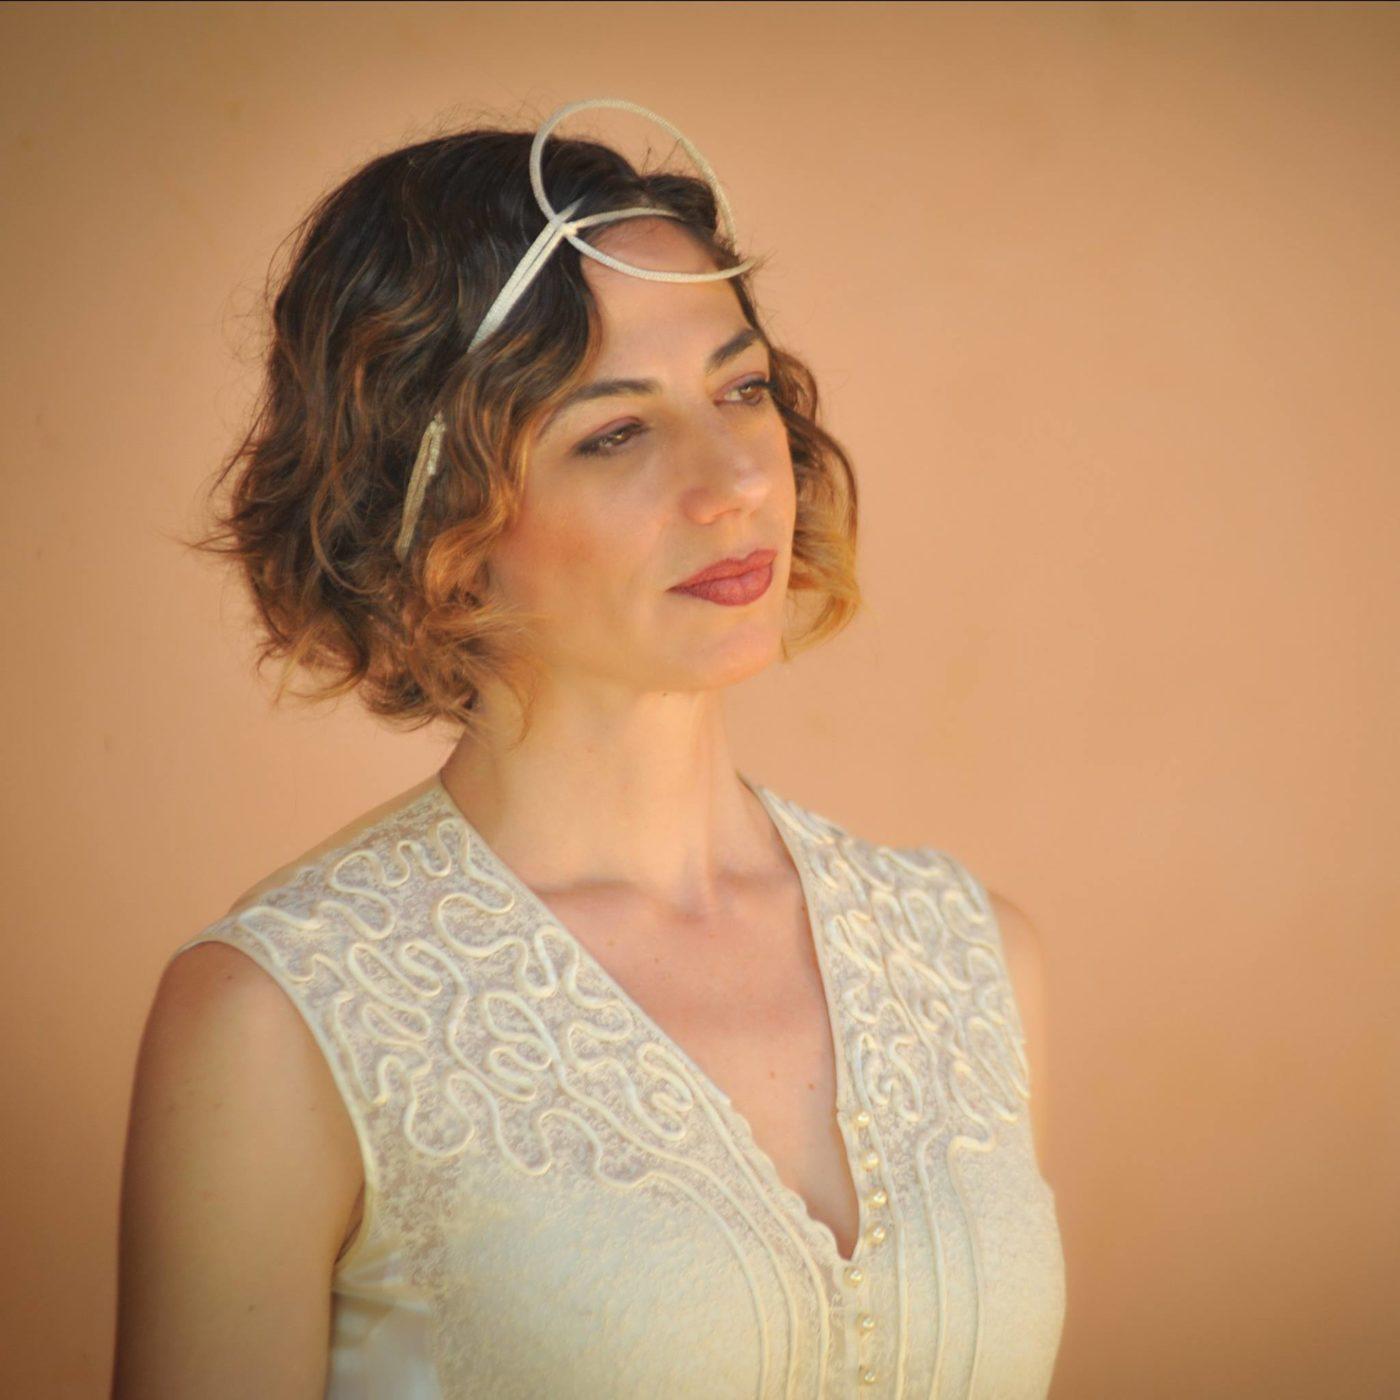 In Musica, Nora Tabbush